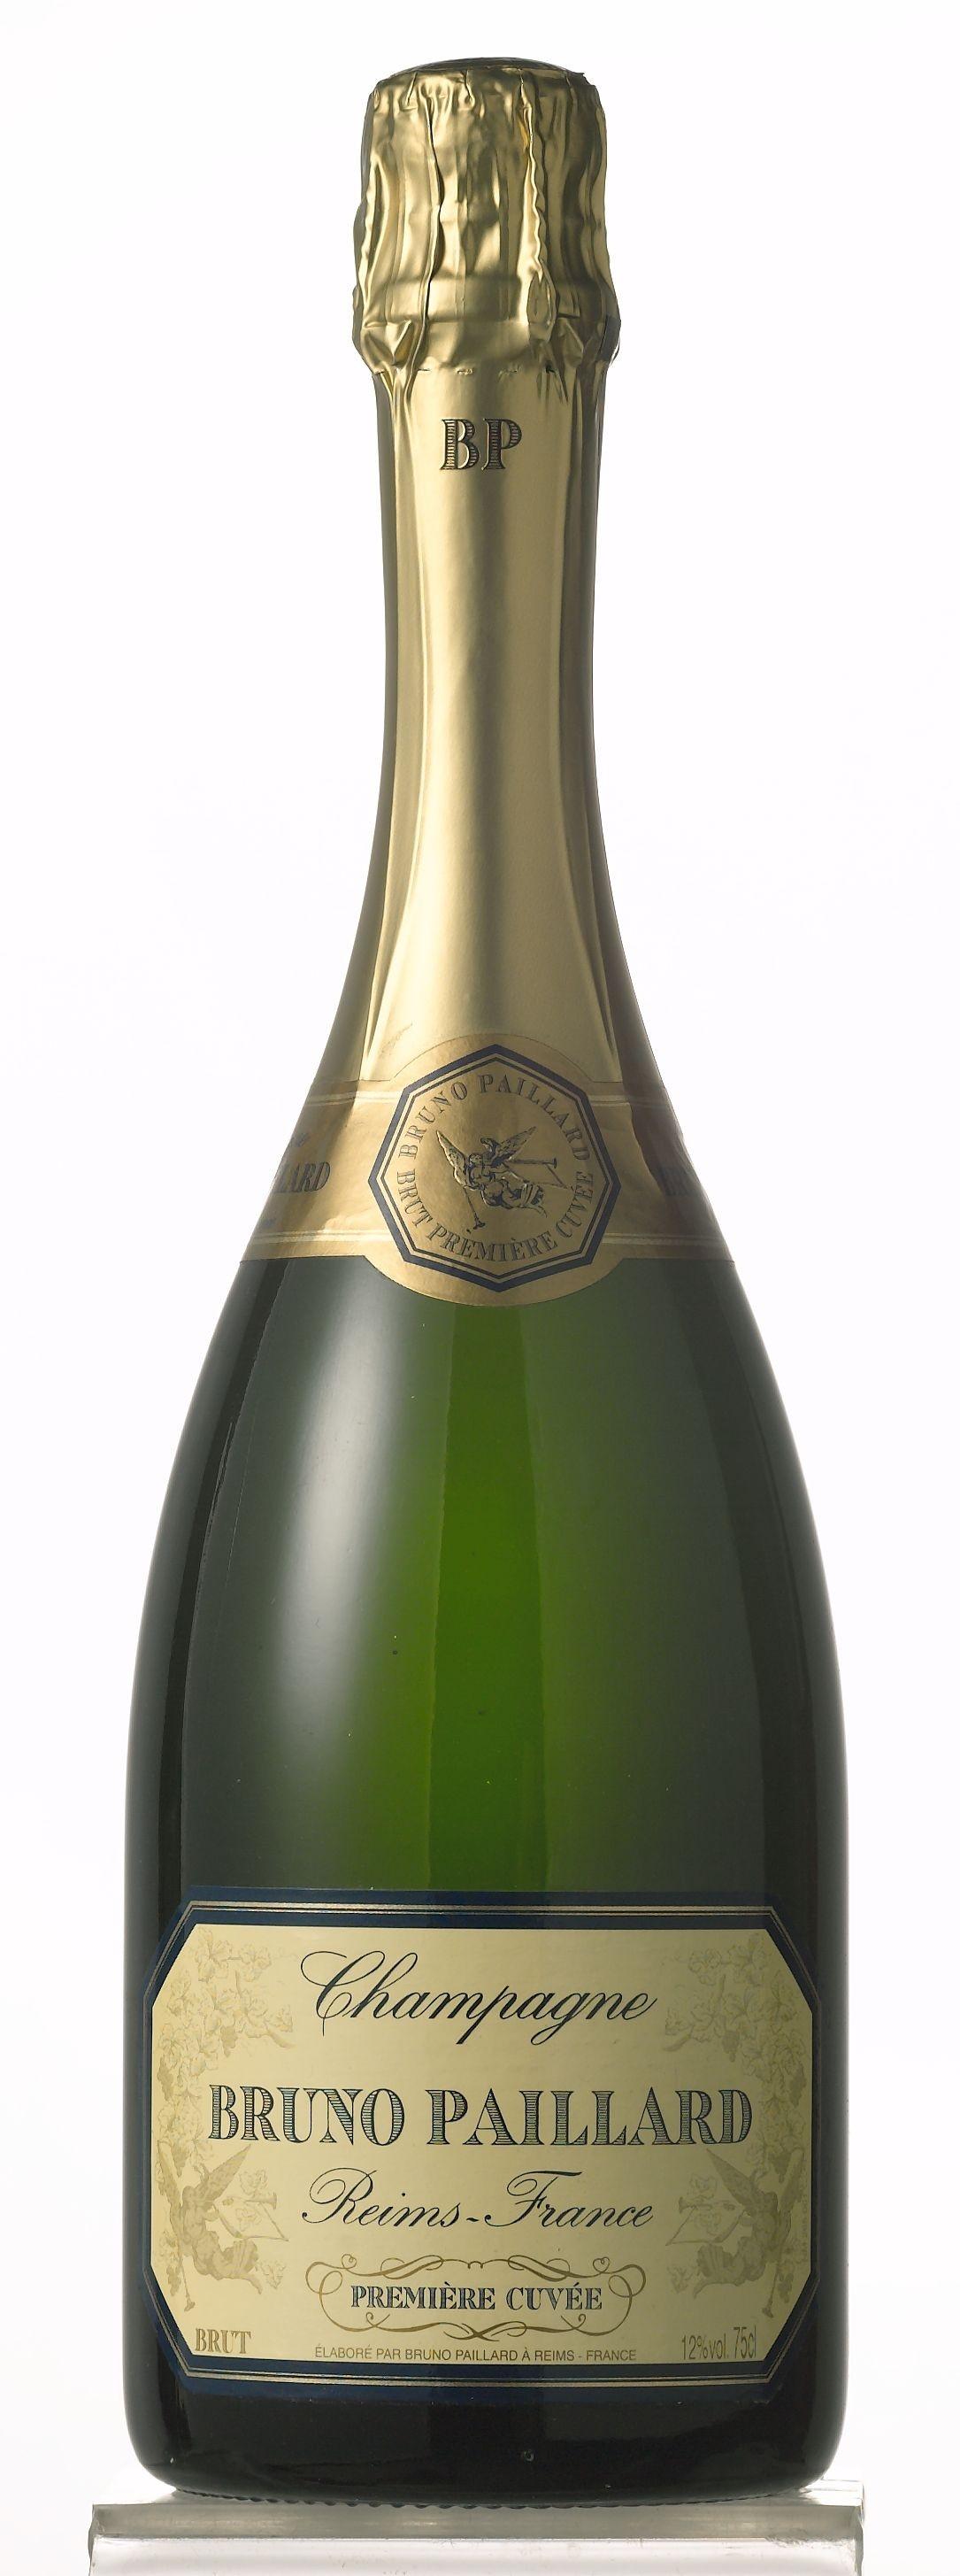 Champagner Bruno Paillard brut Premiere Cuvee